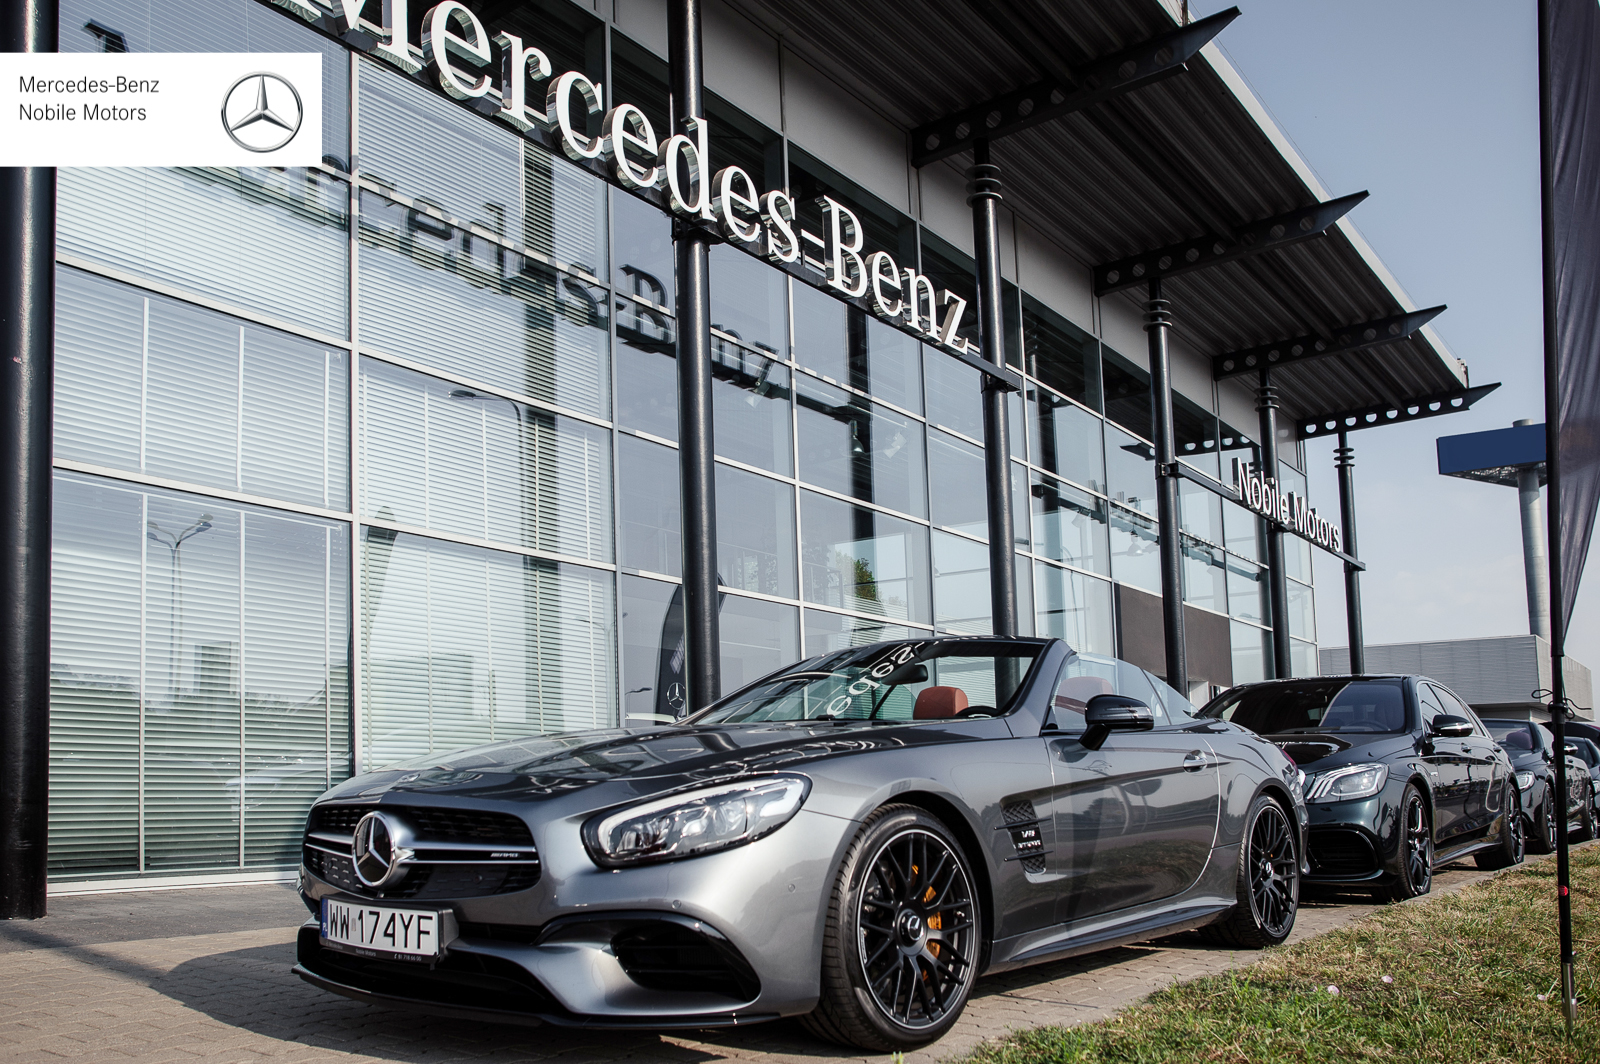 Mercedes lublin